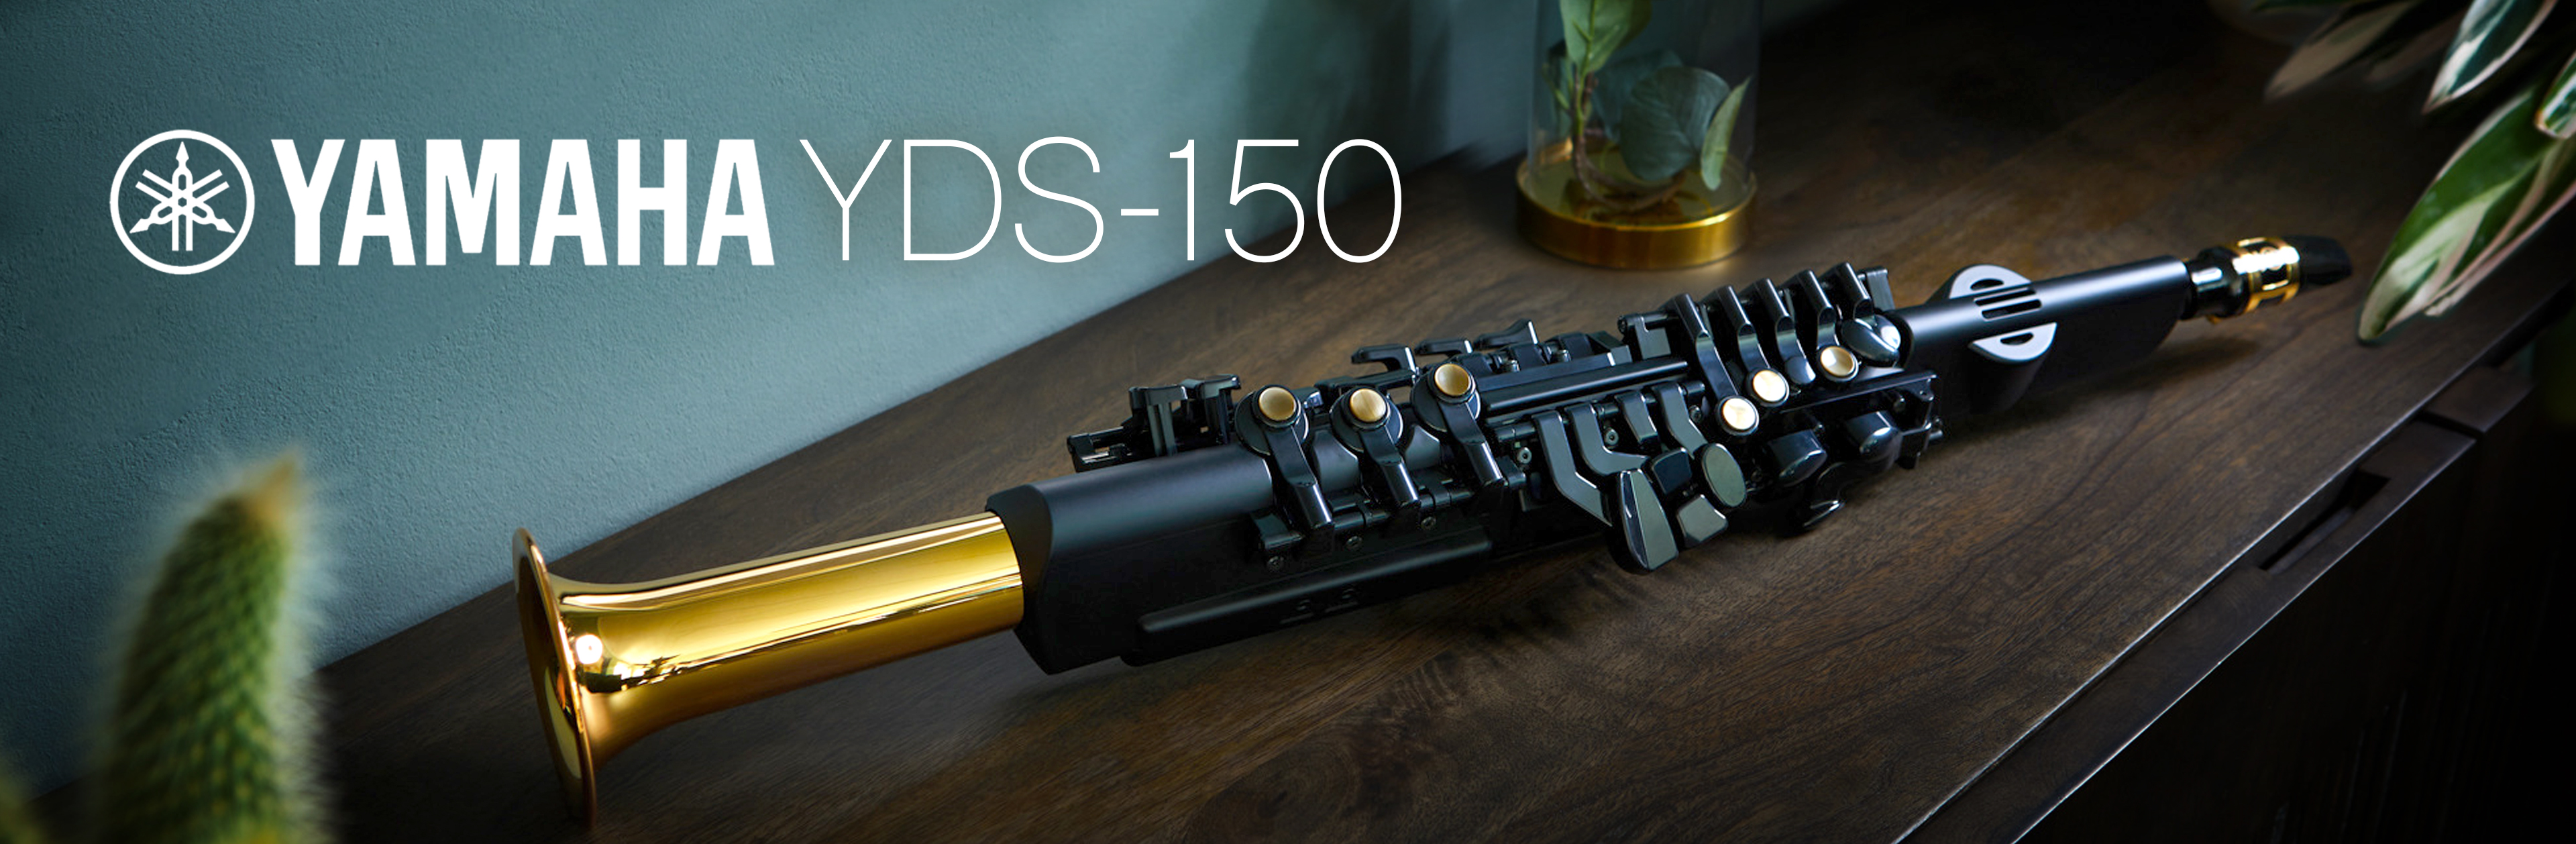 Banner_Yamaha-YDS-150-Digital-SaxophonetNtzIuGwZU53L